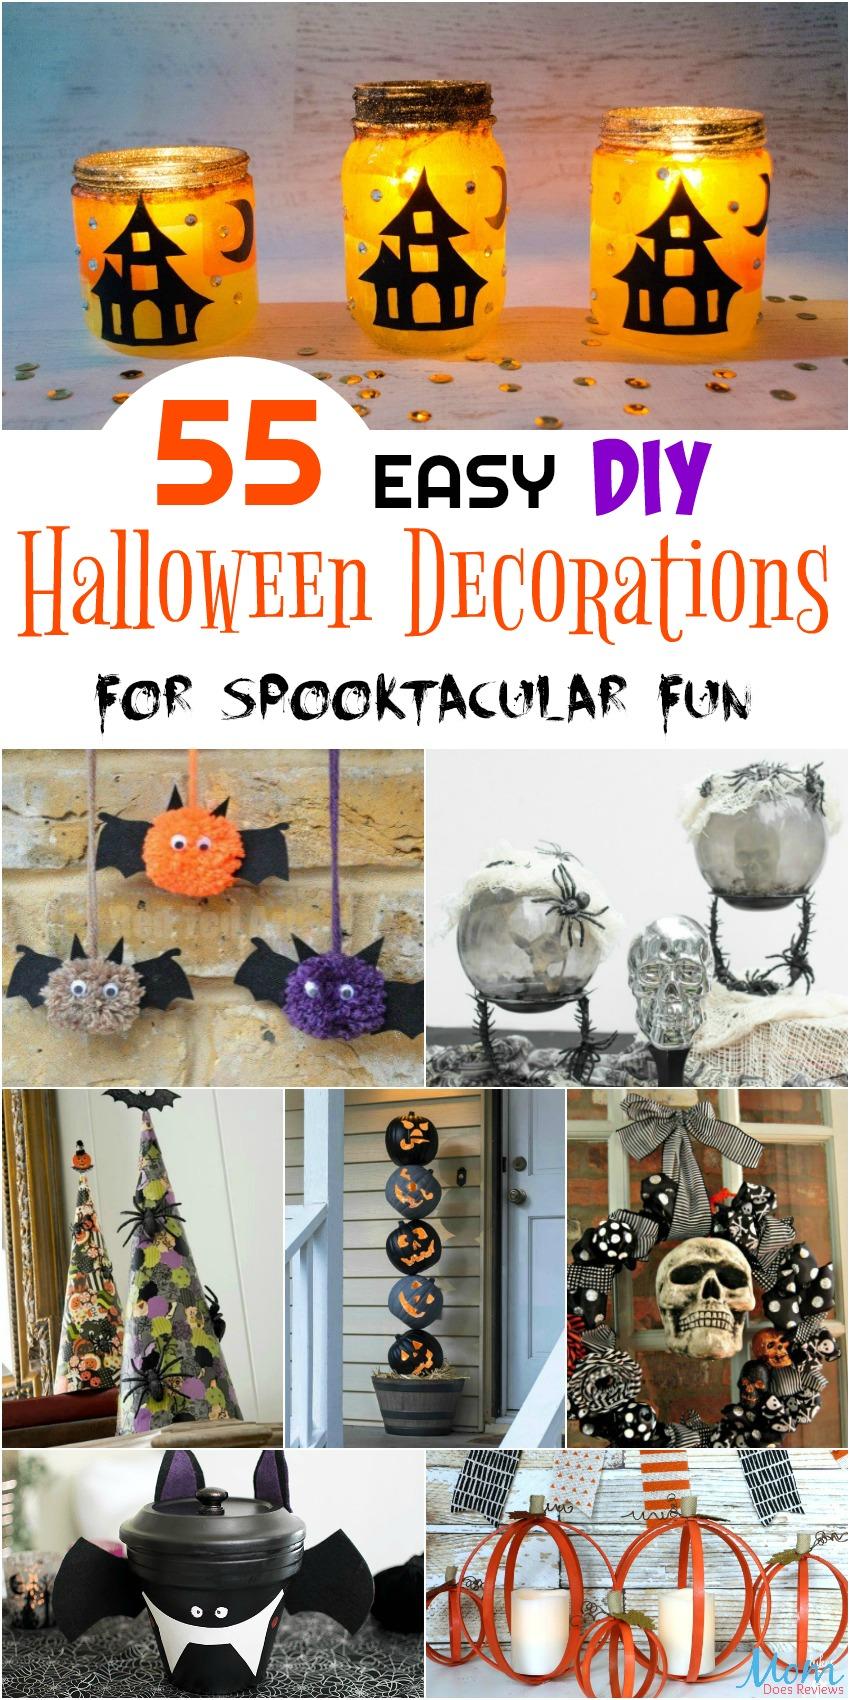 55 Easy Diy Halloween Decorations For Spooktacular Fun Easy Diy Halloween Decorations Diy Halloween Decorations Easy Diy Halloween